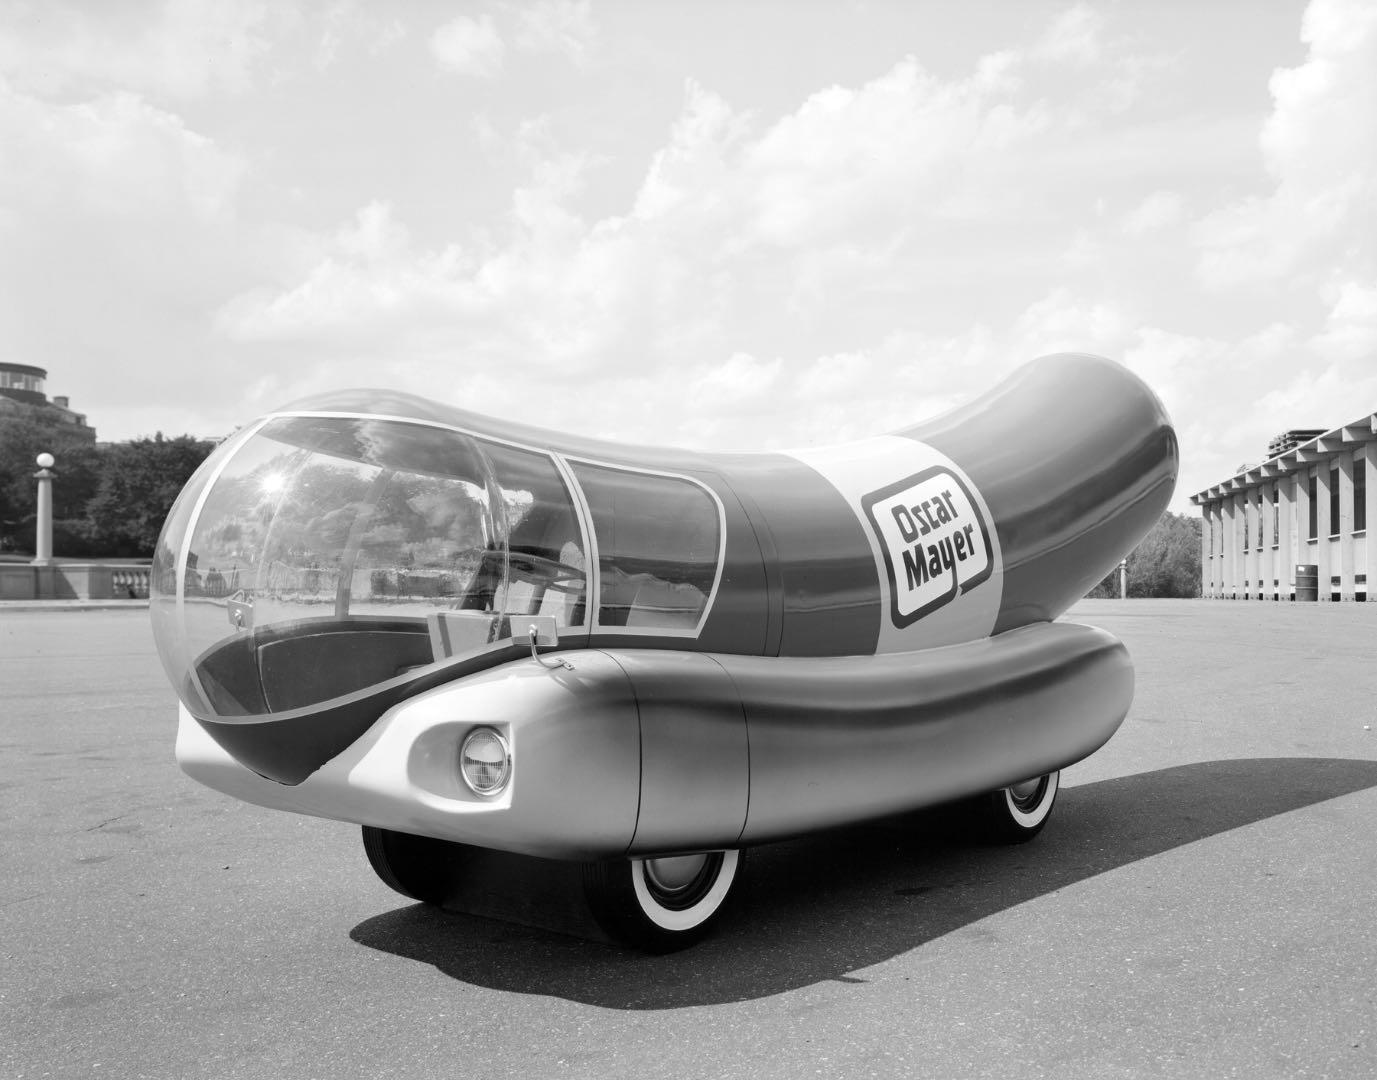 Oscar Mayer Wienermobile, 1958